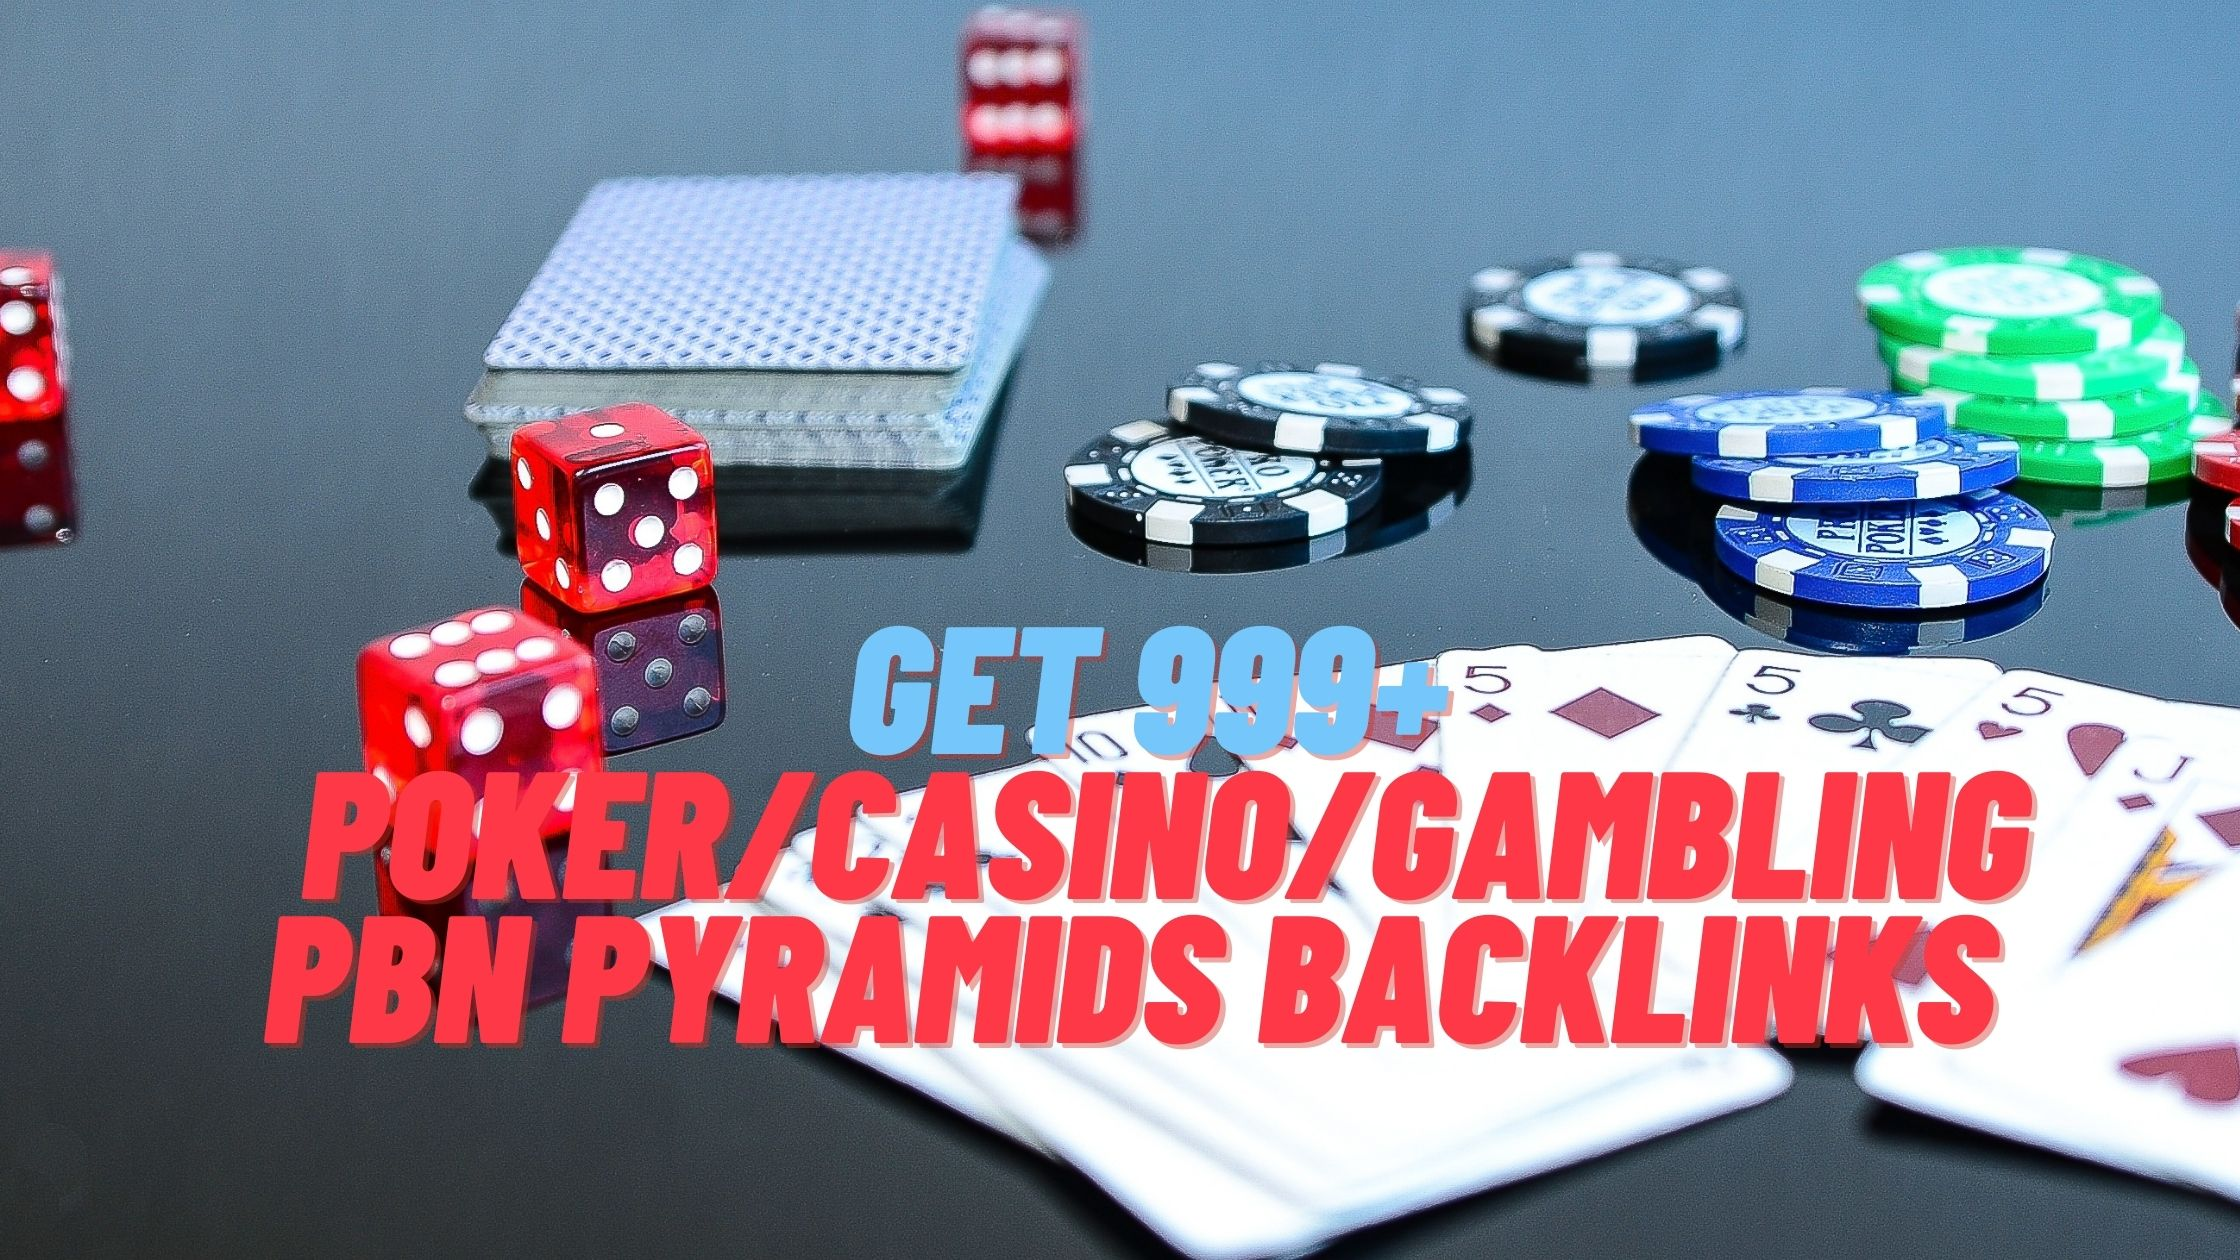 Get 999+ Poker/Casino/Gambling PBN Pyramids backlinks Super Boost for SERP Google Ranking